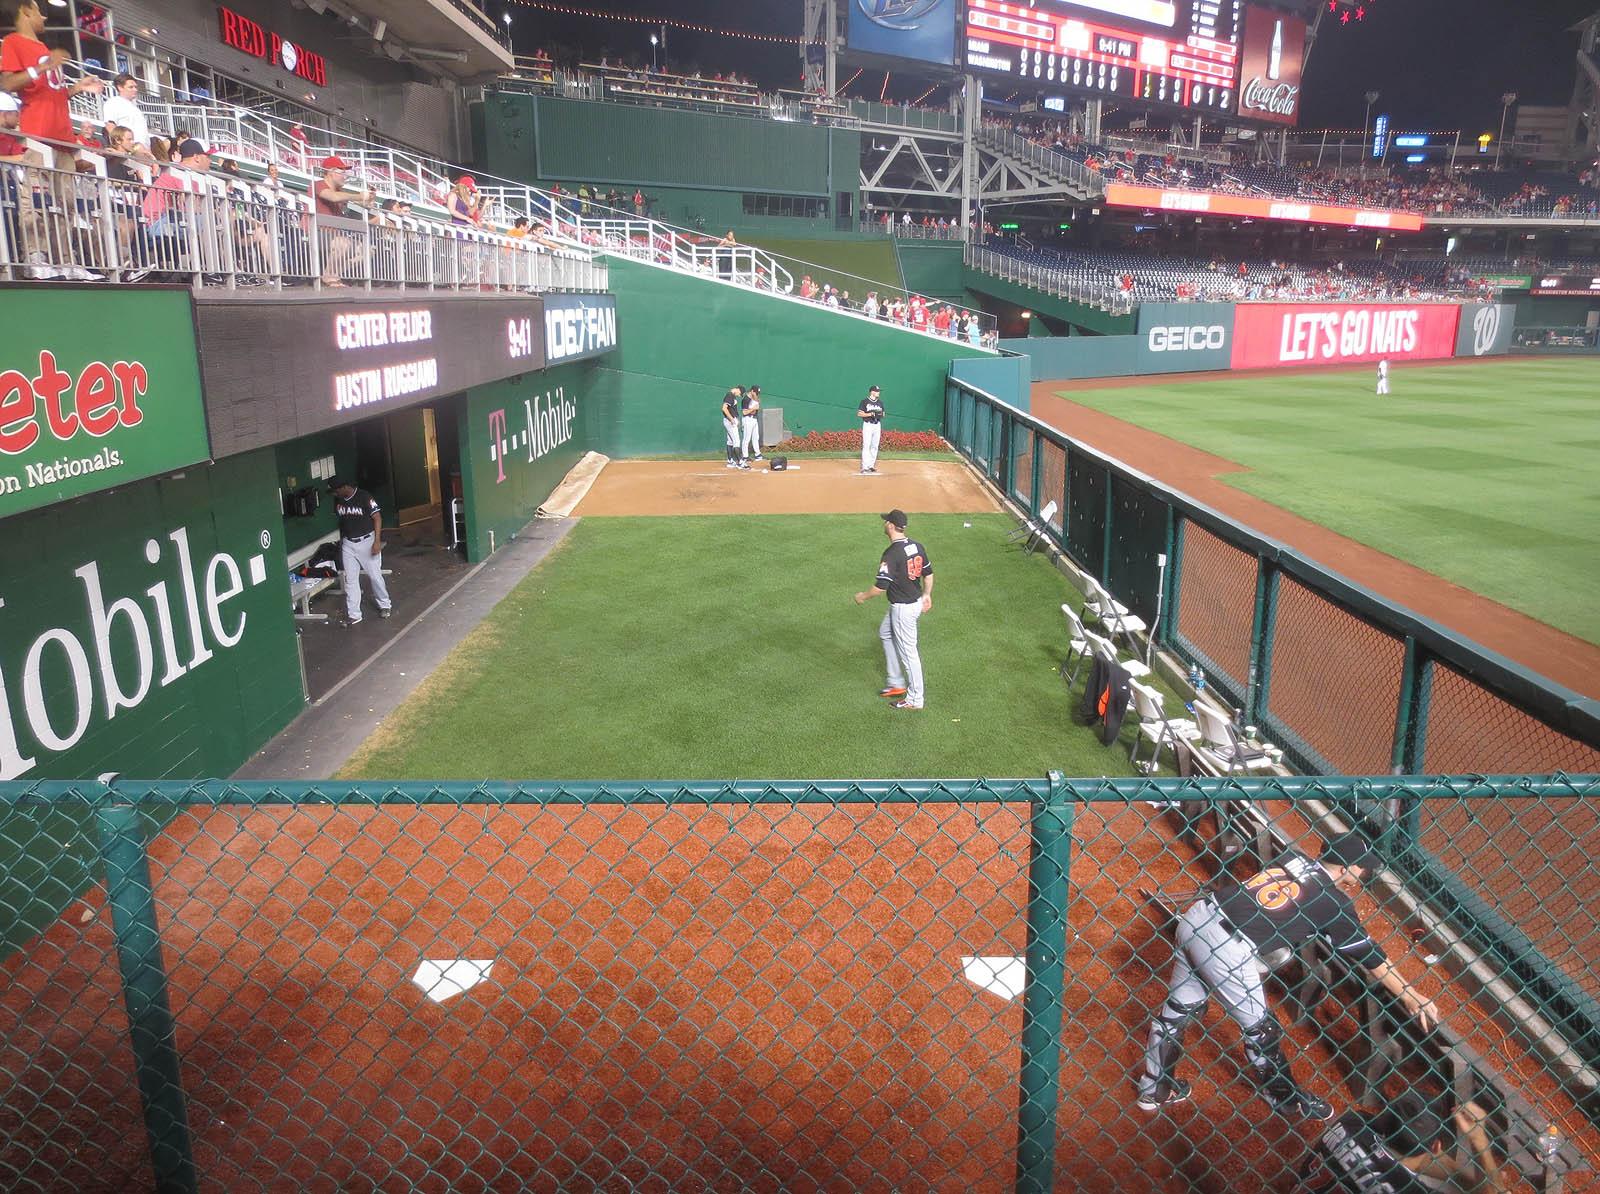 8 27 13 At Nationals Park The Baseball Collector